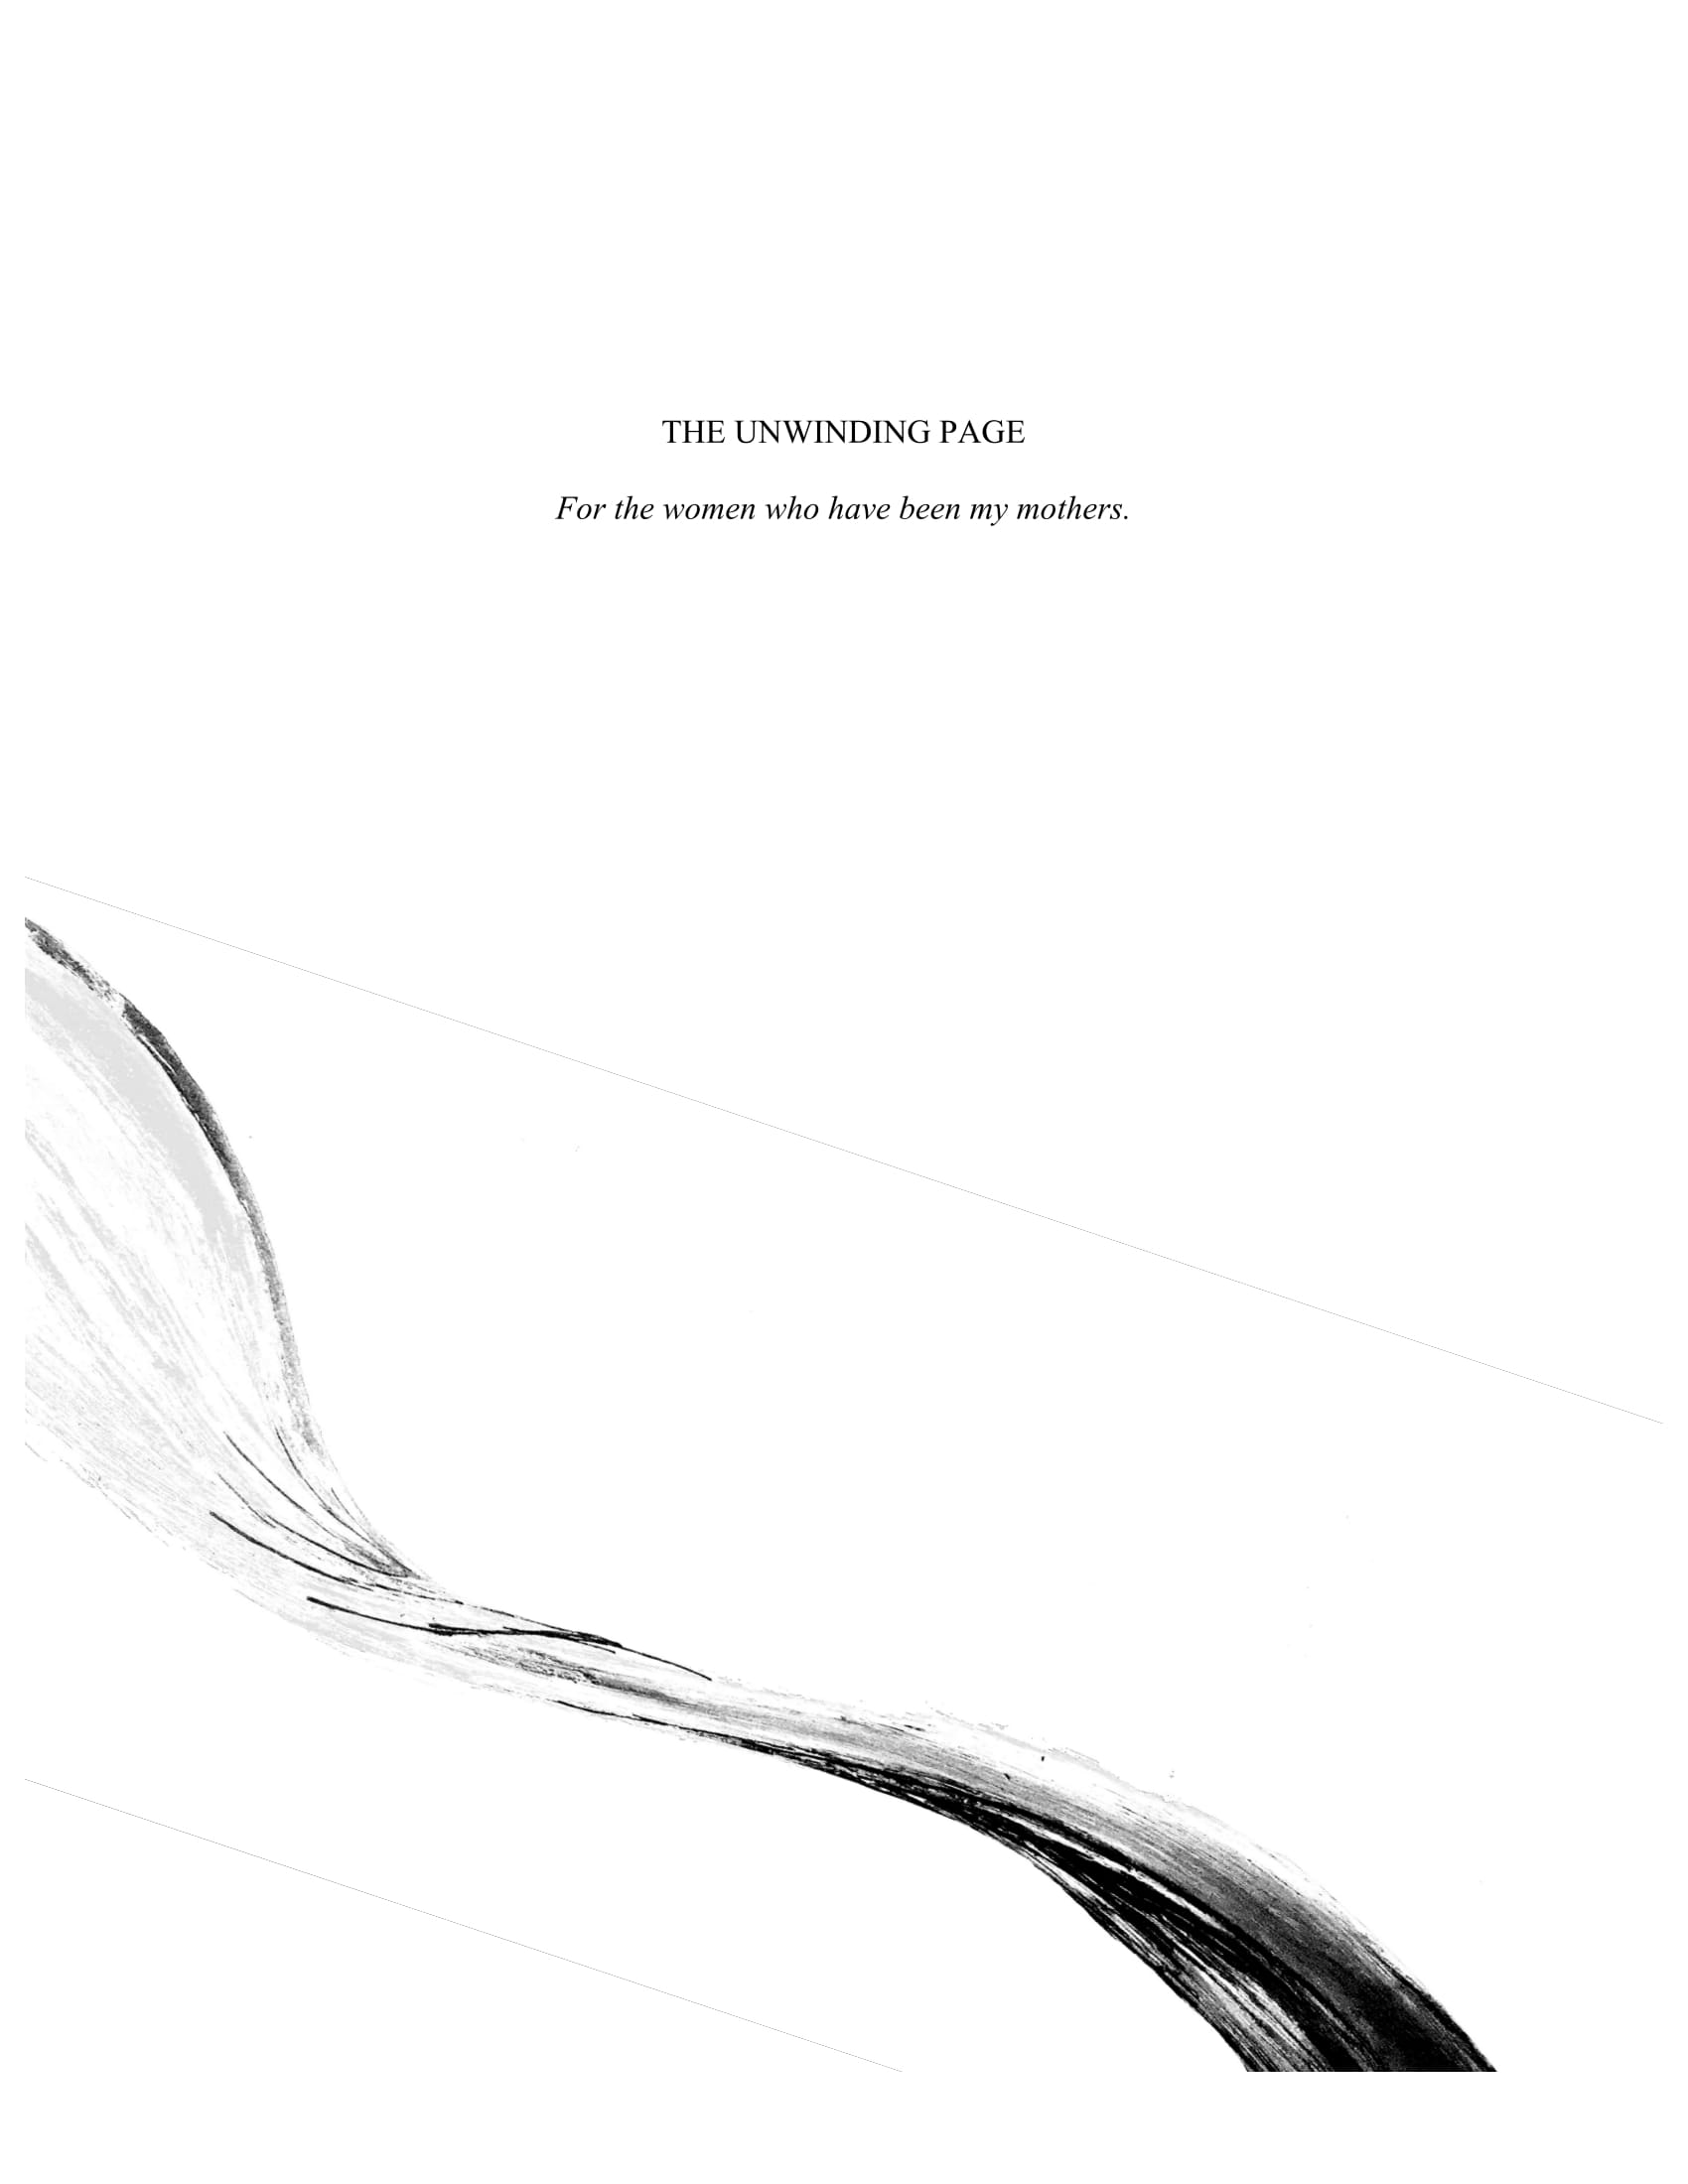 2017.10.31 UNWINDING PAGE-02.jpg